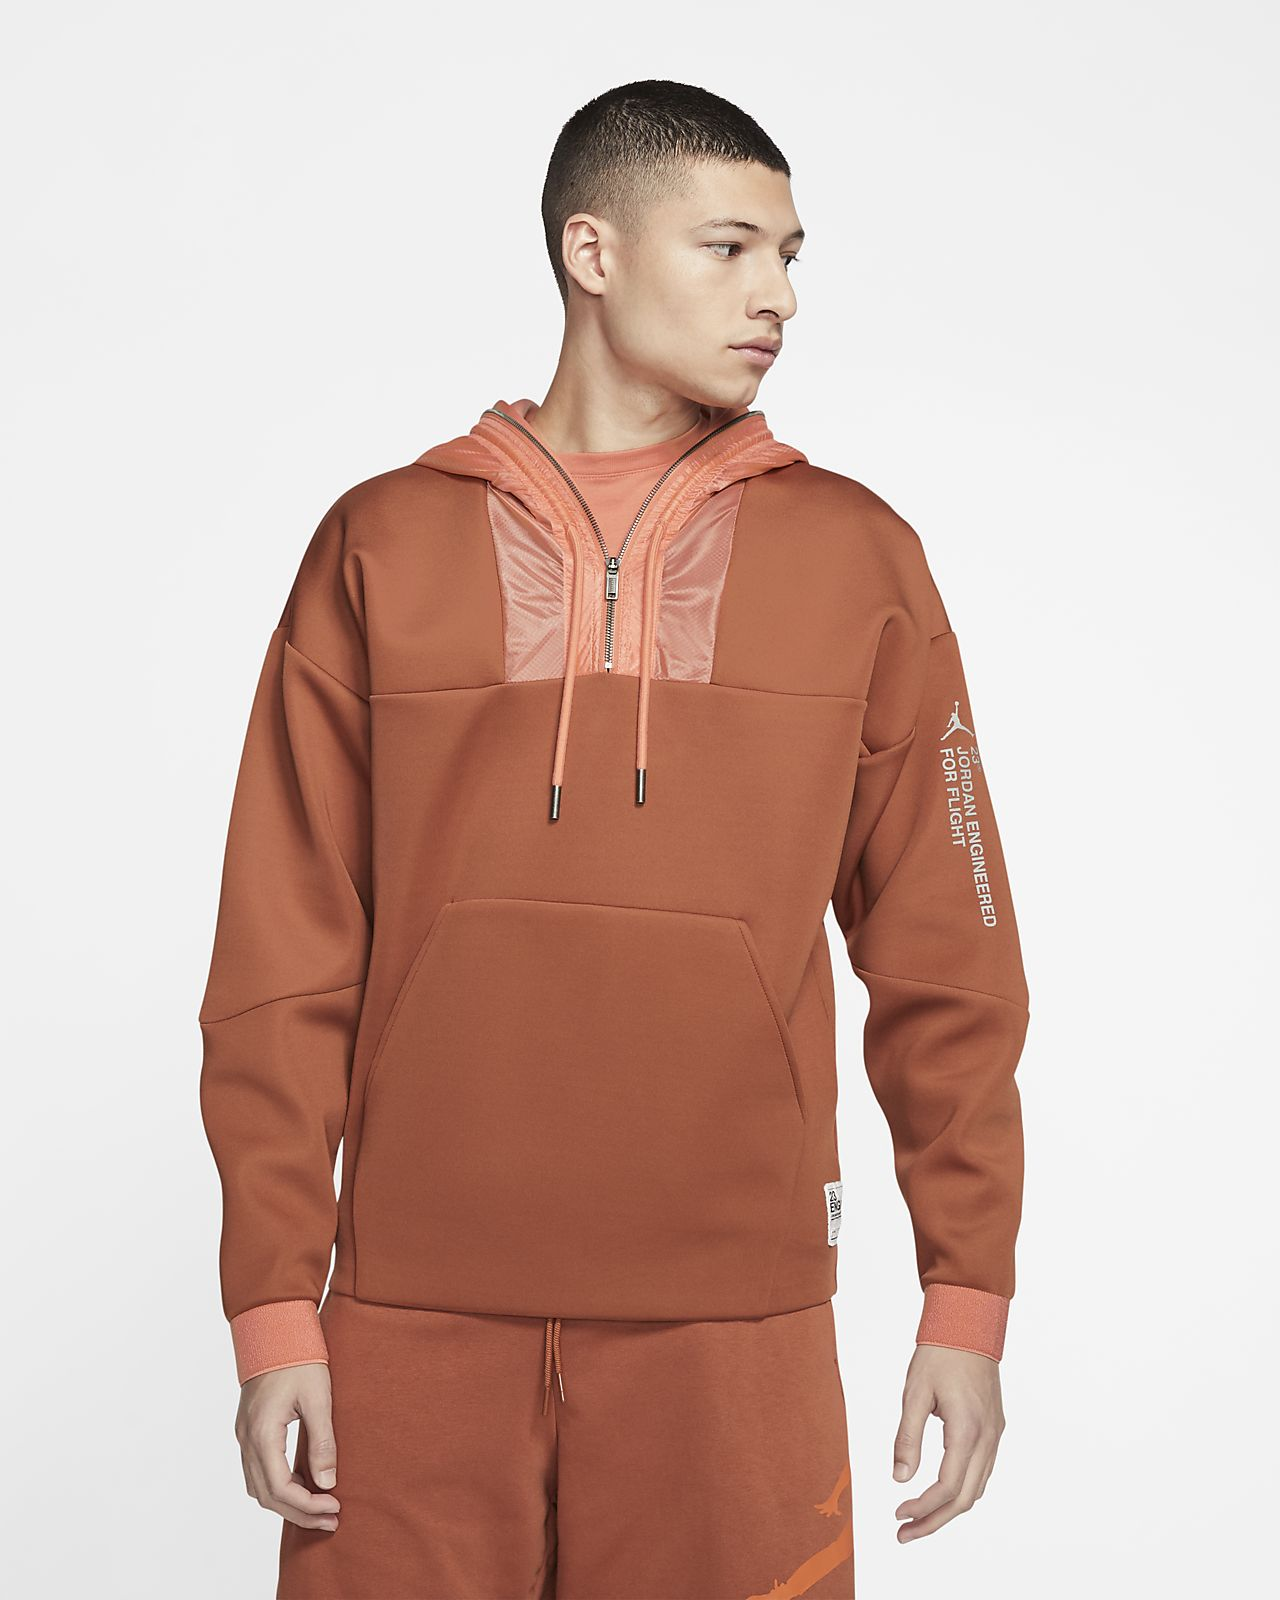 Subproducto carpeta Universidad  Jordan 23 Engineered 1/2-Zip Pullover Hoodie. Nike ZA